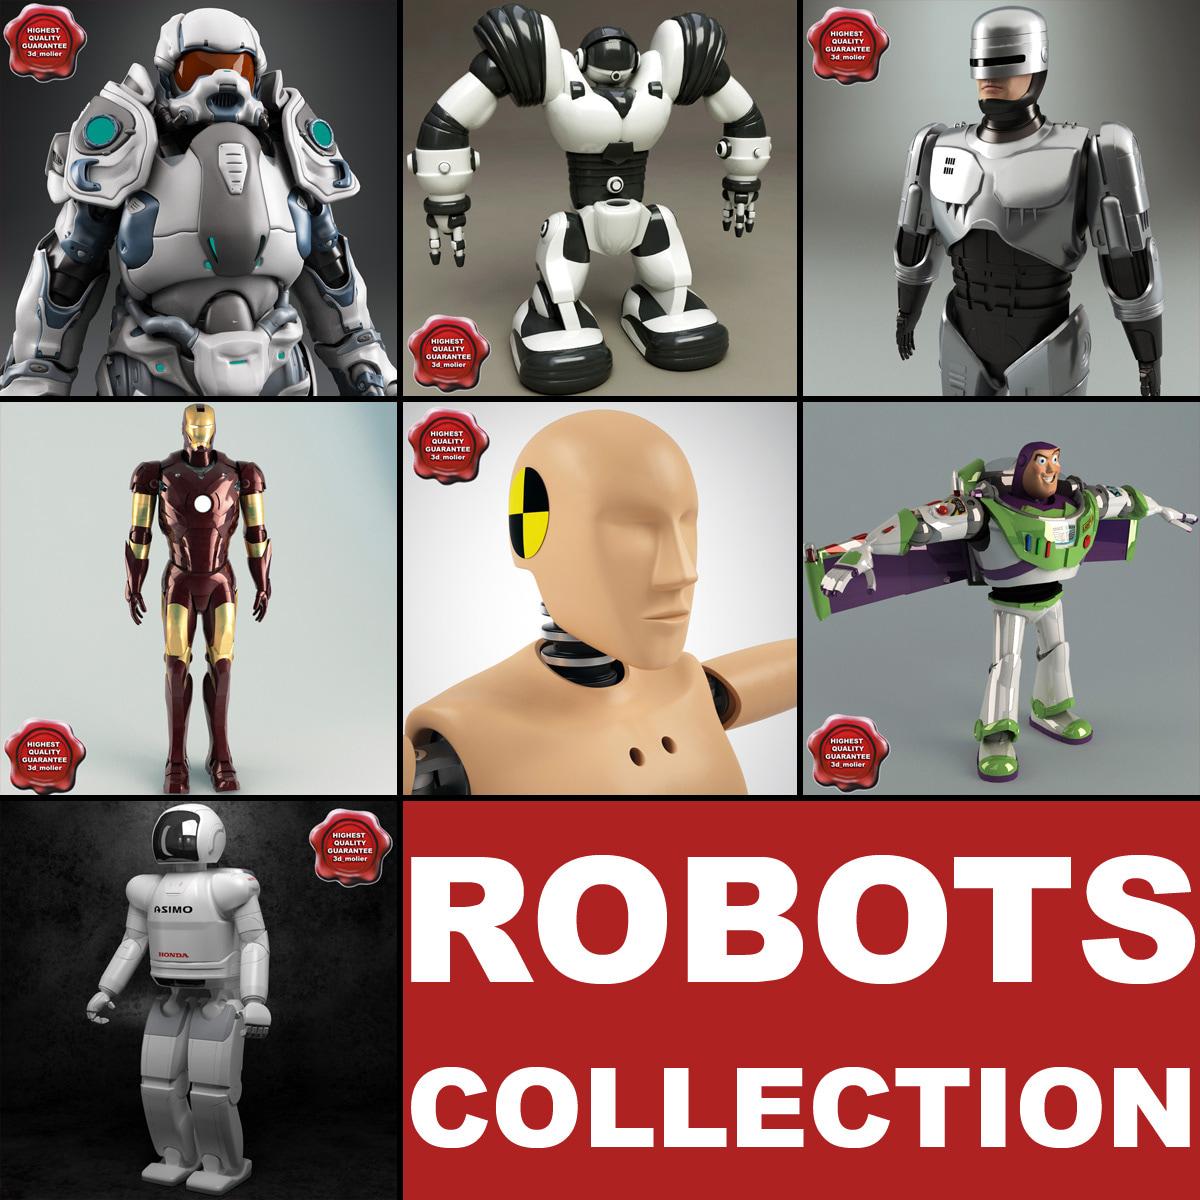 Robots_Collection_V4_000.jpg